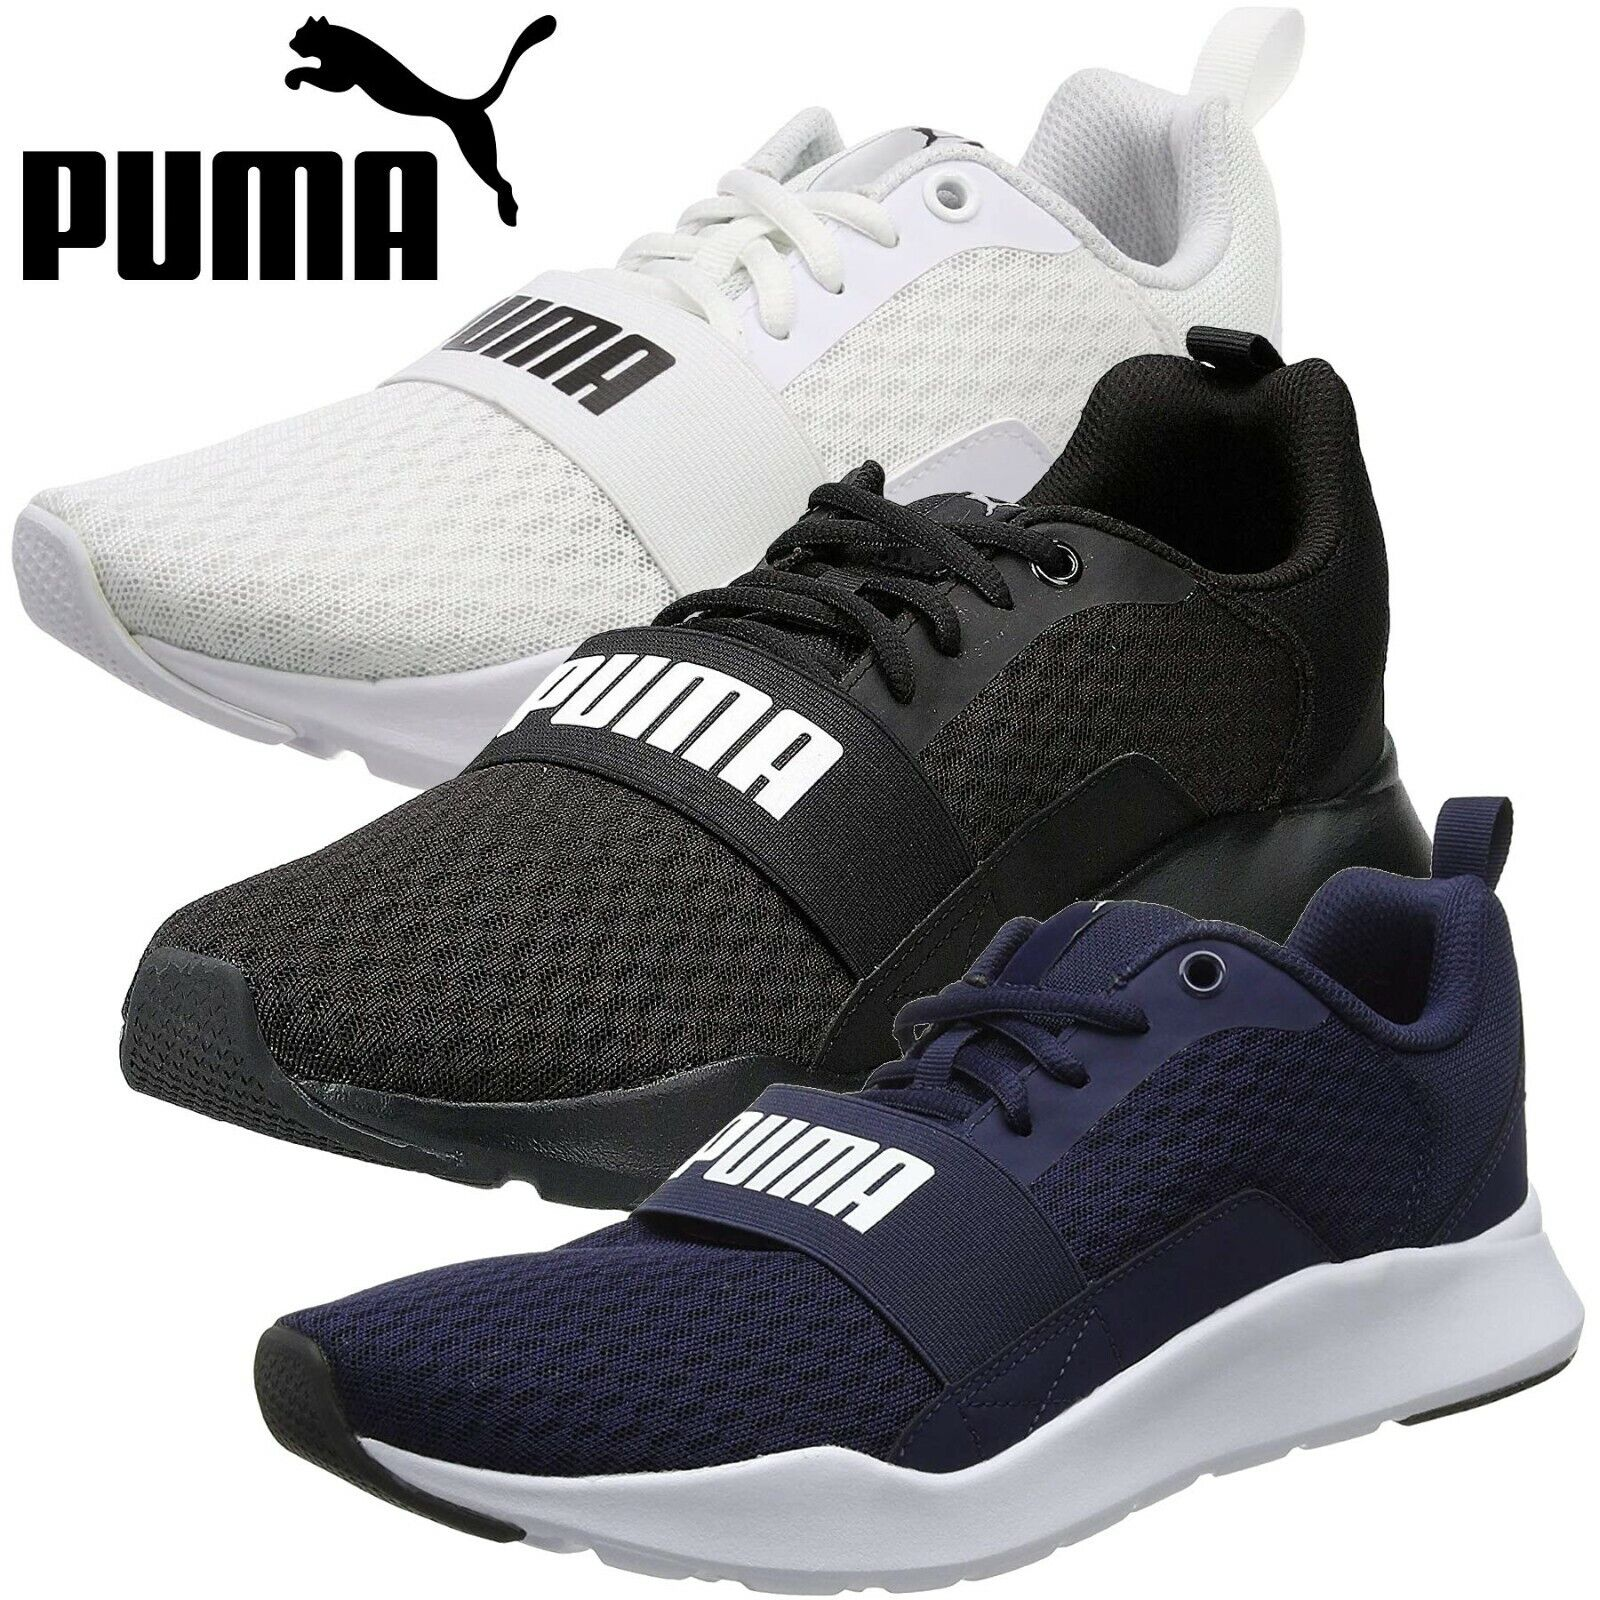 PUMA Wired Unisex Running Shoes Men's